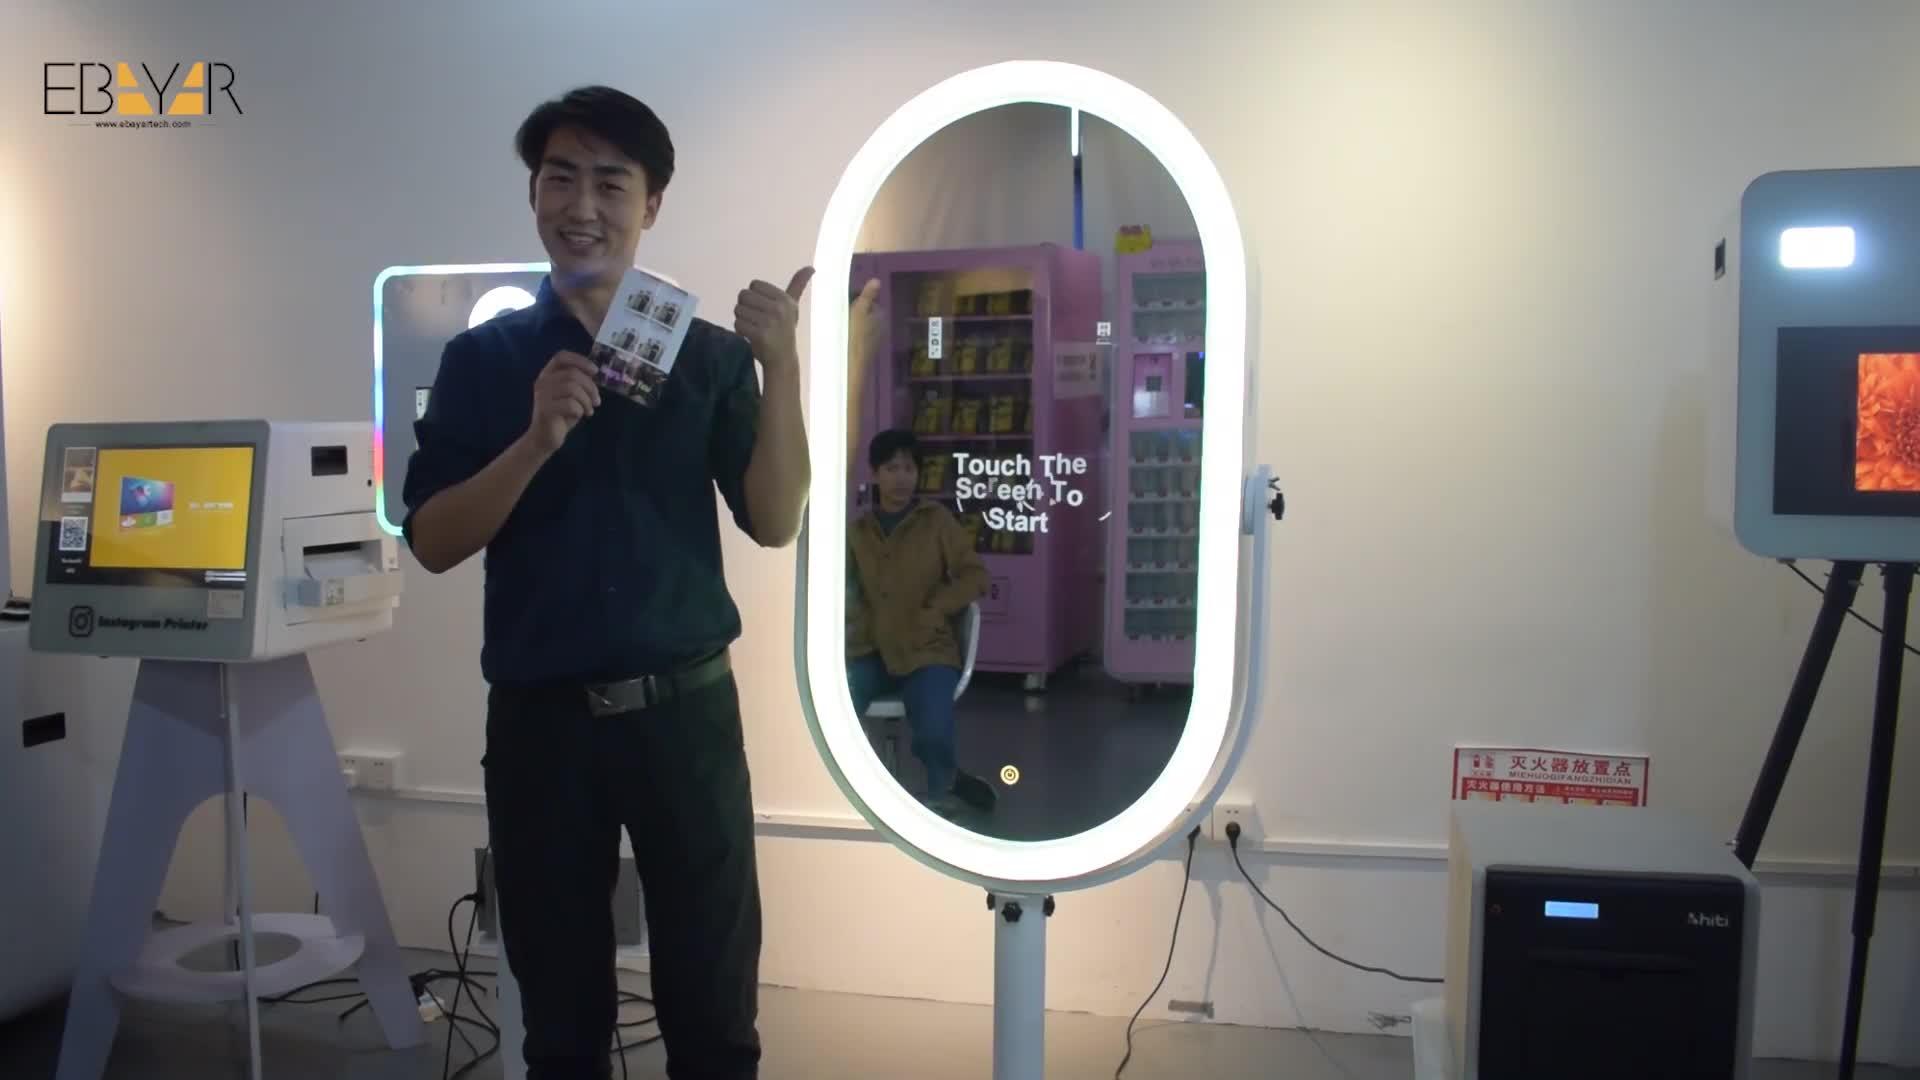 Magic Mirror Photo Booth สำหรับขาย Selfie Fotomation แบบพกพา Photo บูธกับ Touch Screen